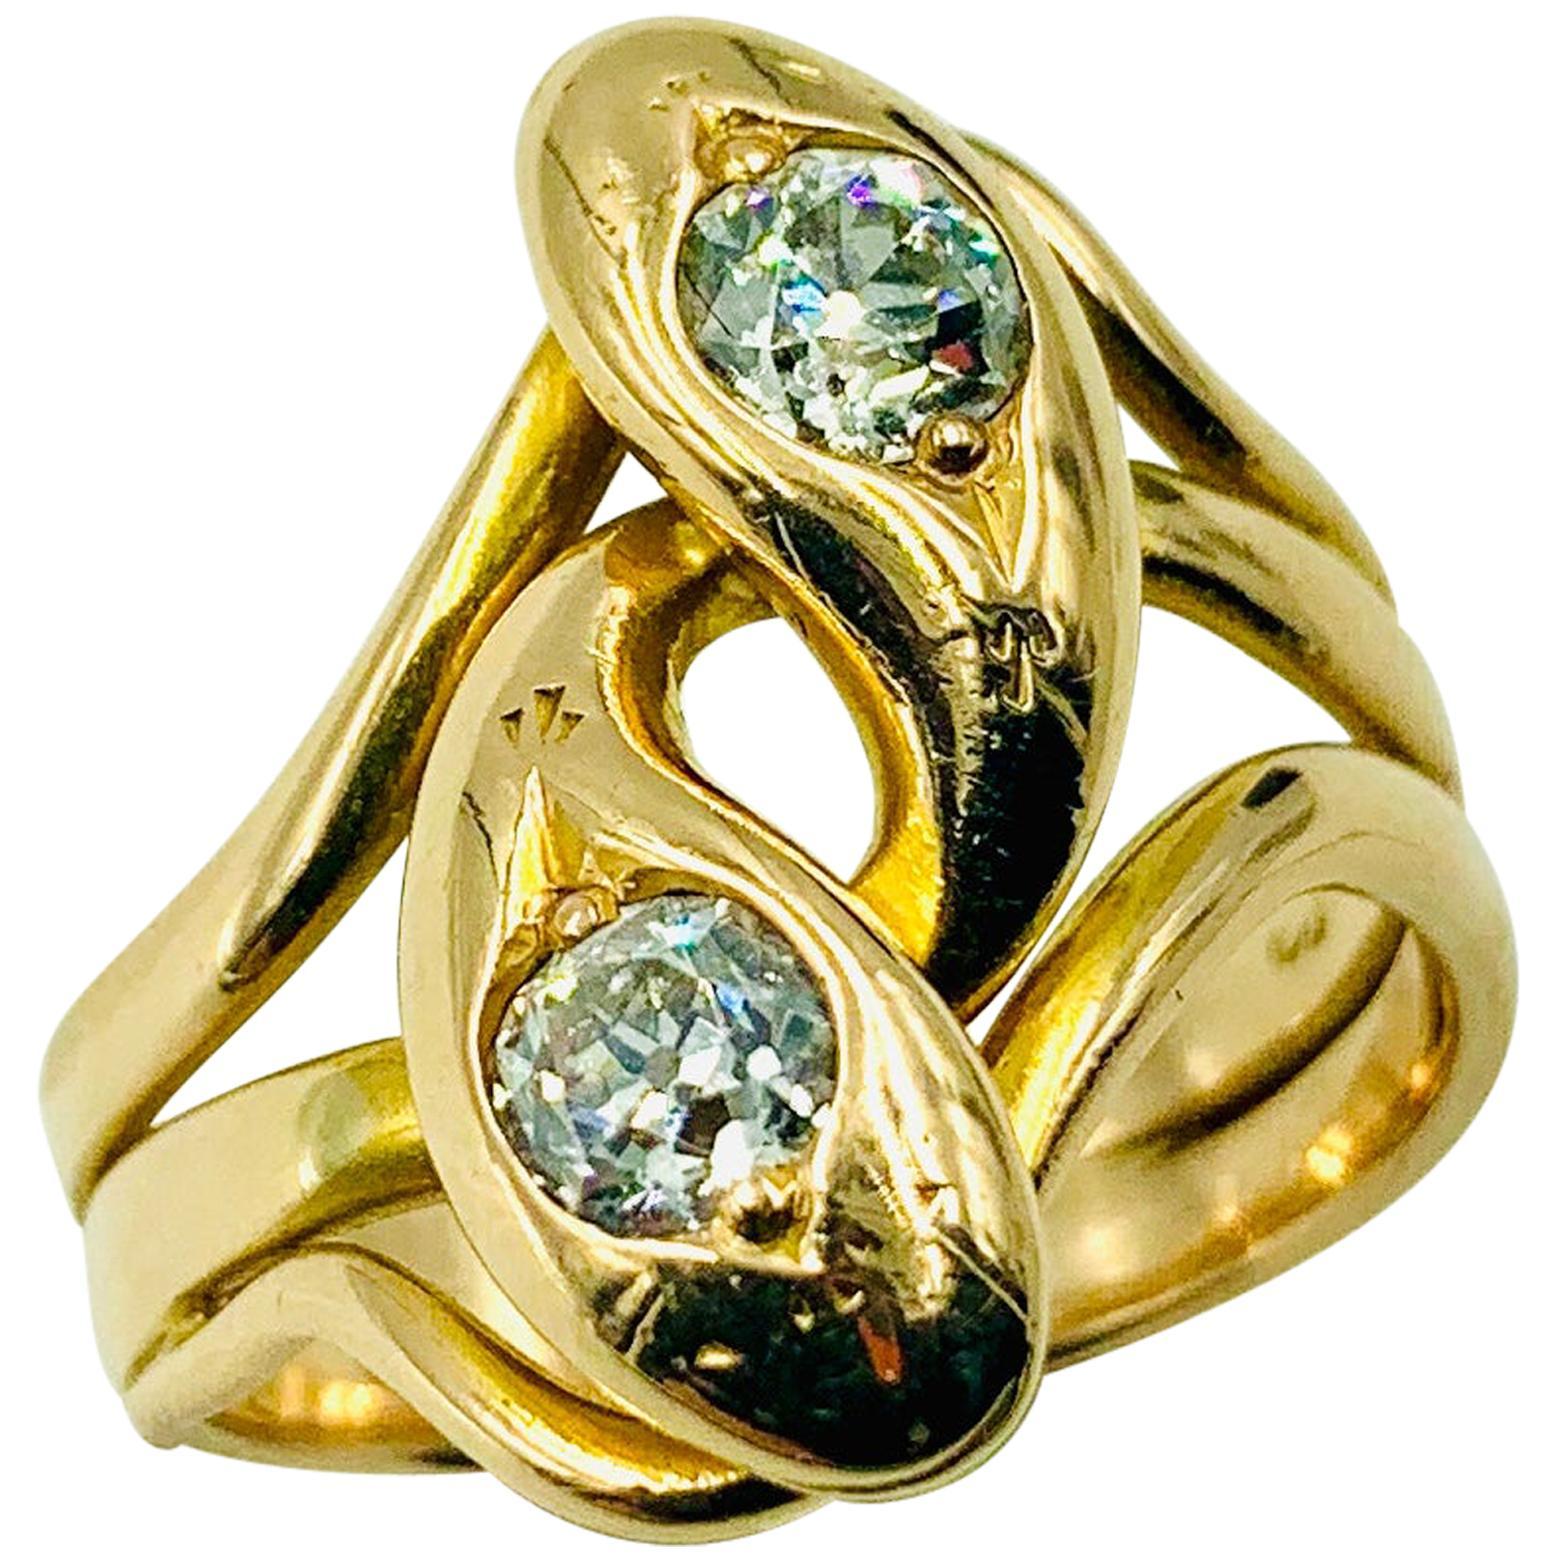 Spectacular Large Double Diamond Snake Ring, 14 Karat Yellow Gold, 19th Century